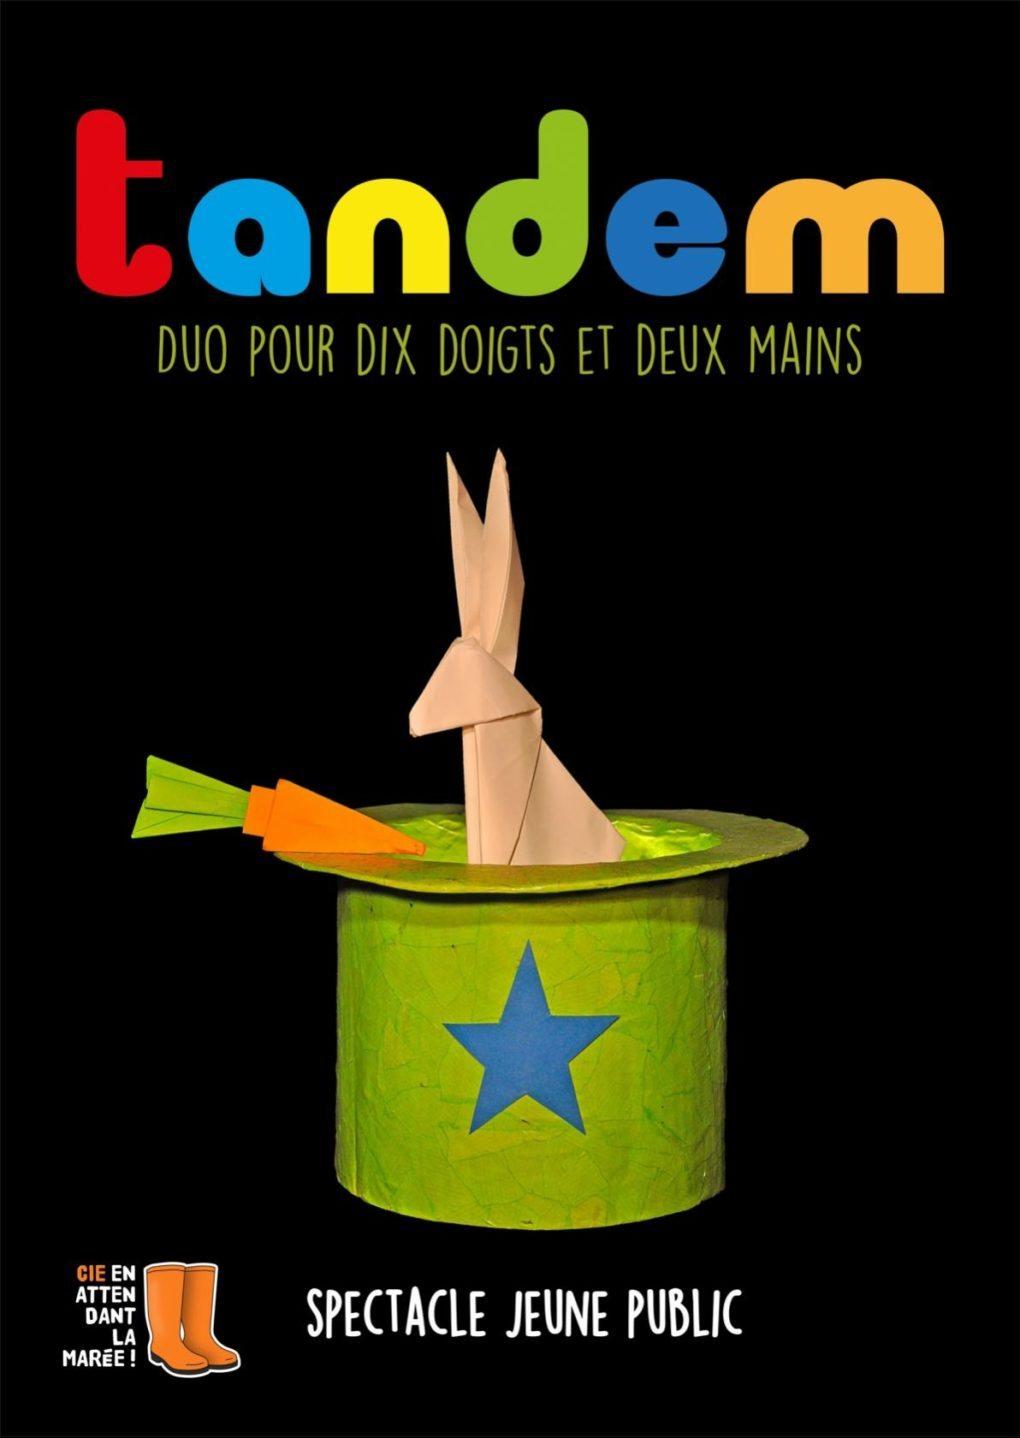 Tandem/Cie en attendant la marée Nantes